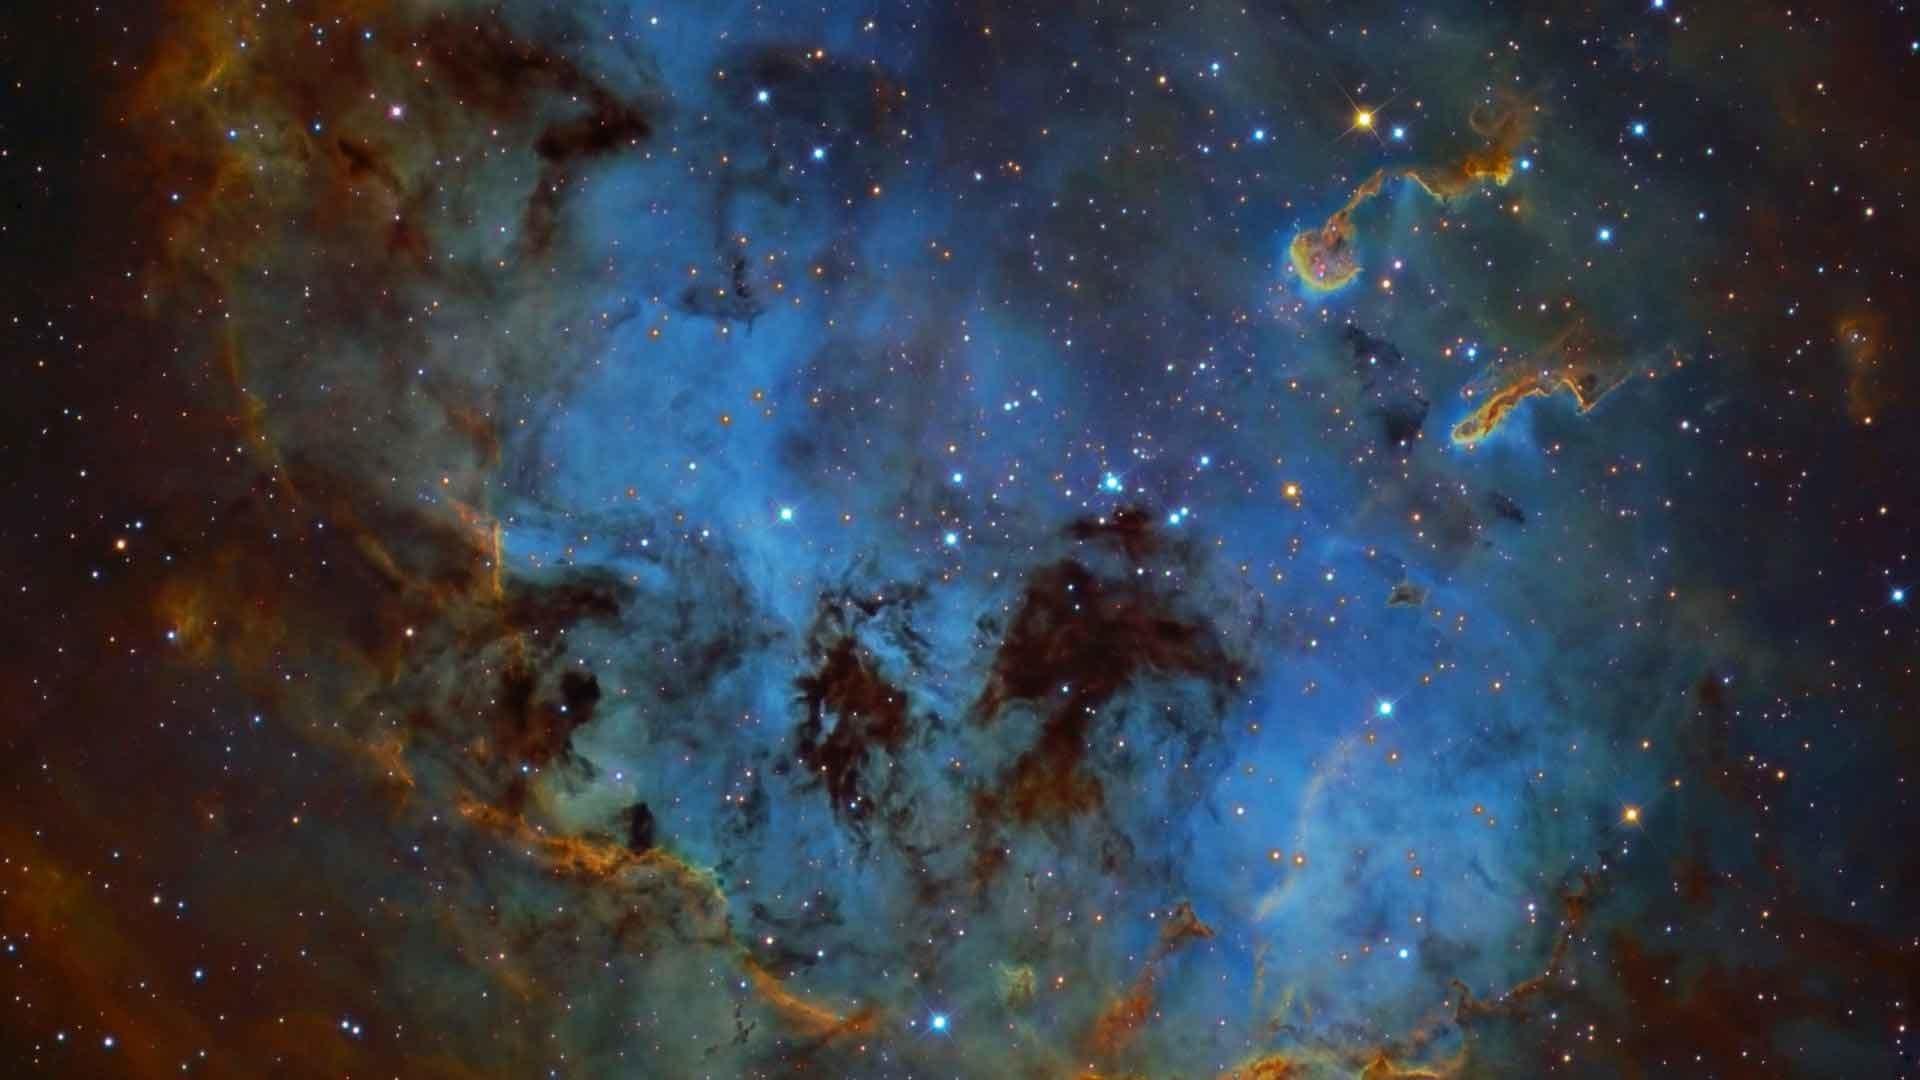 Space Galaxies Hubble Nasa Outer Stars Nature Wallpaper Screensaver Free  Download